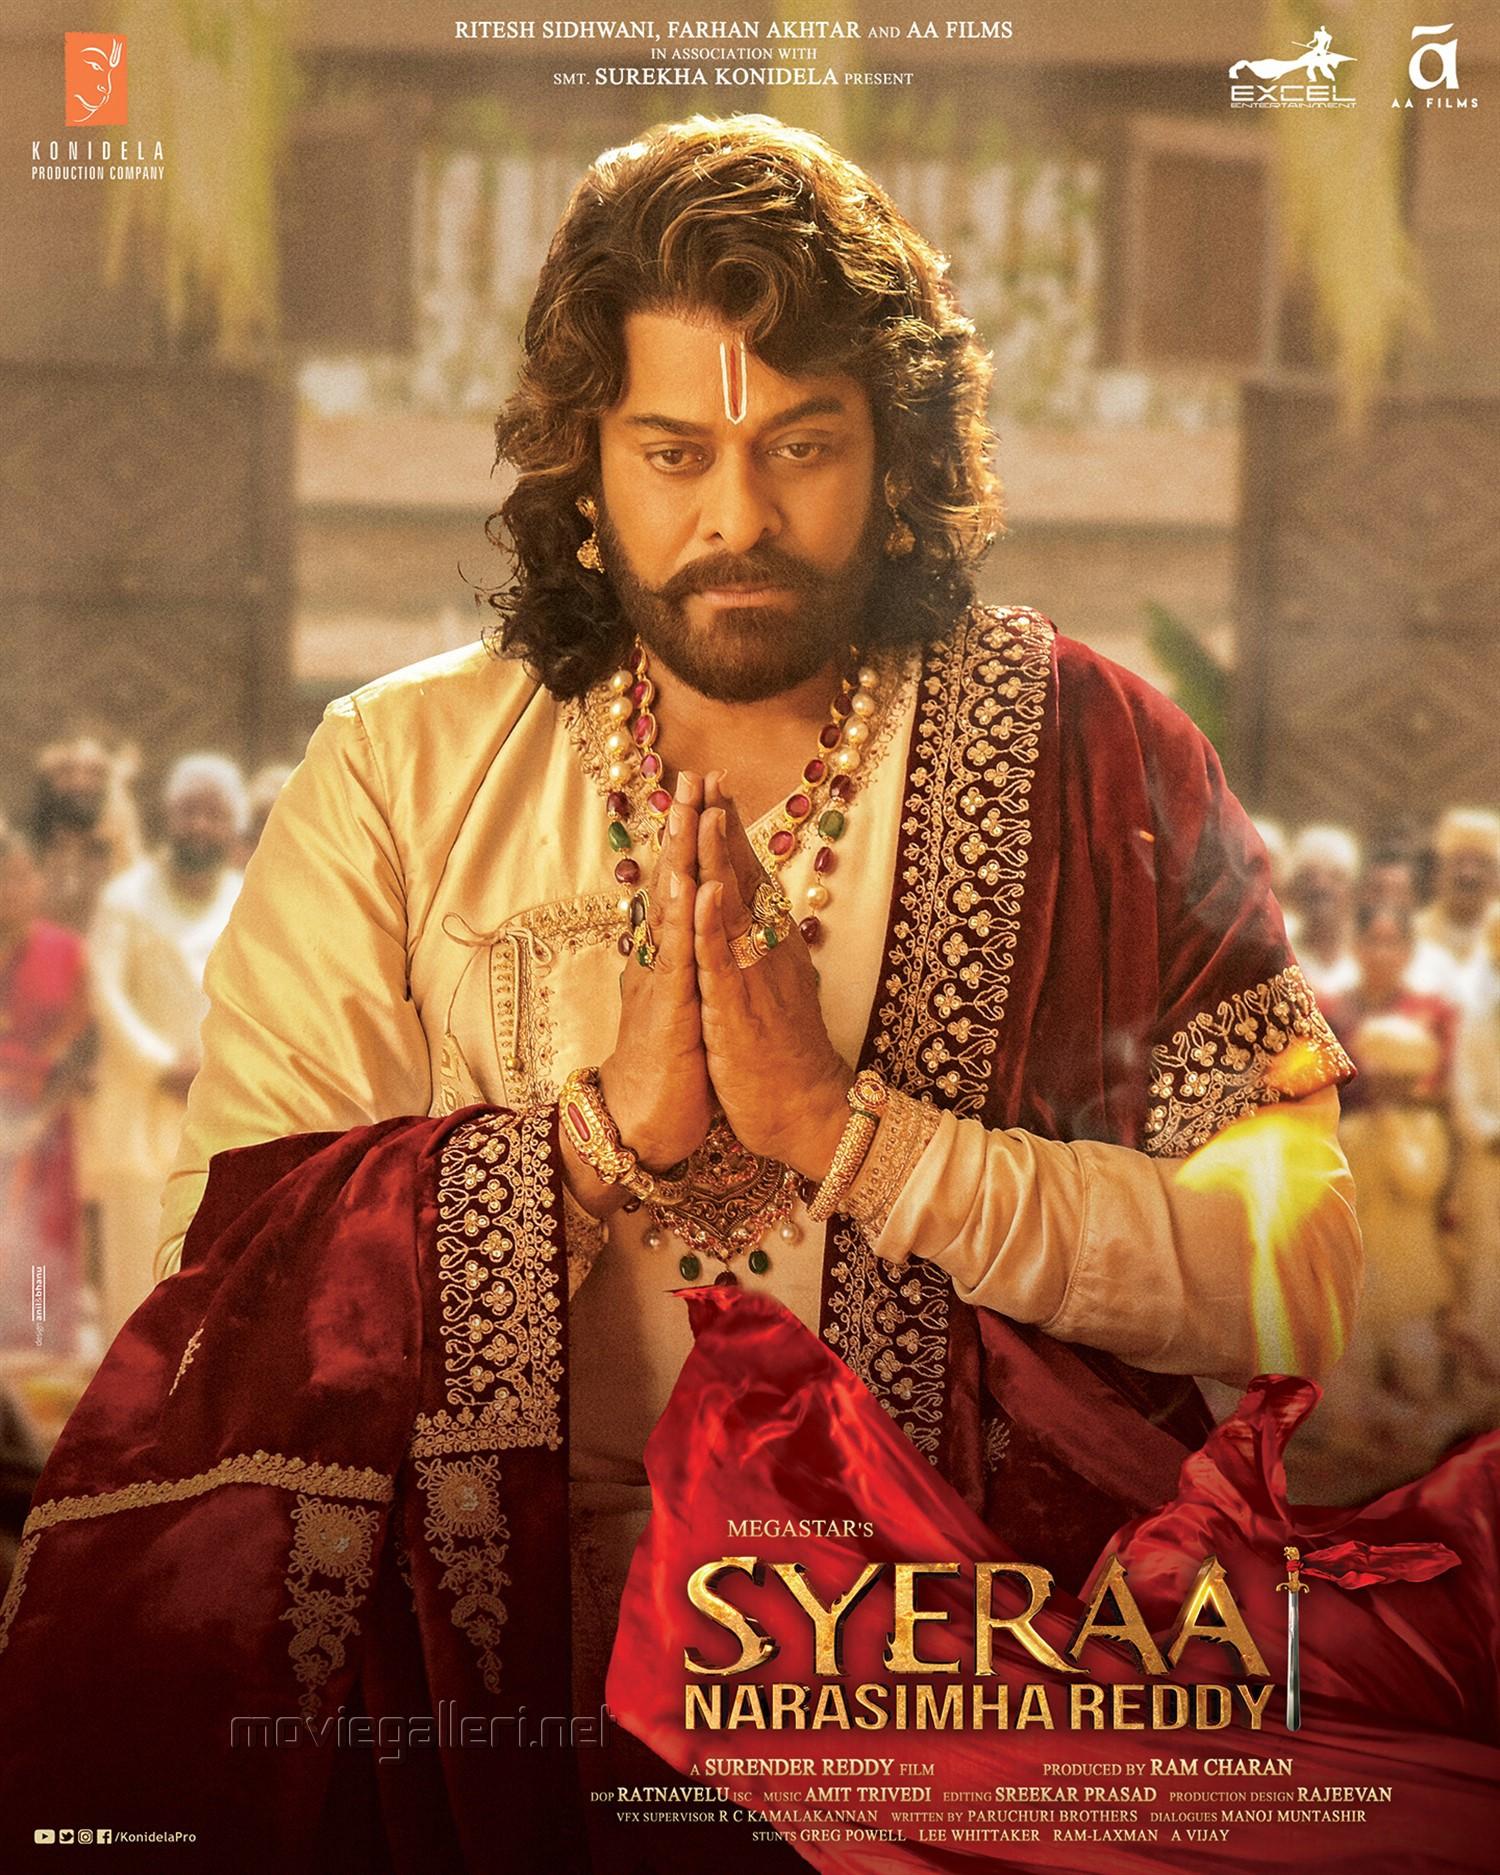 Chiranjeevi Syeraa Narasimha Reddy Latest Posters HD